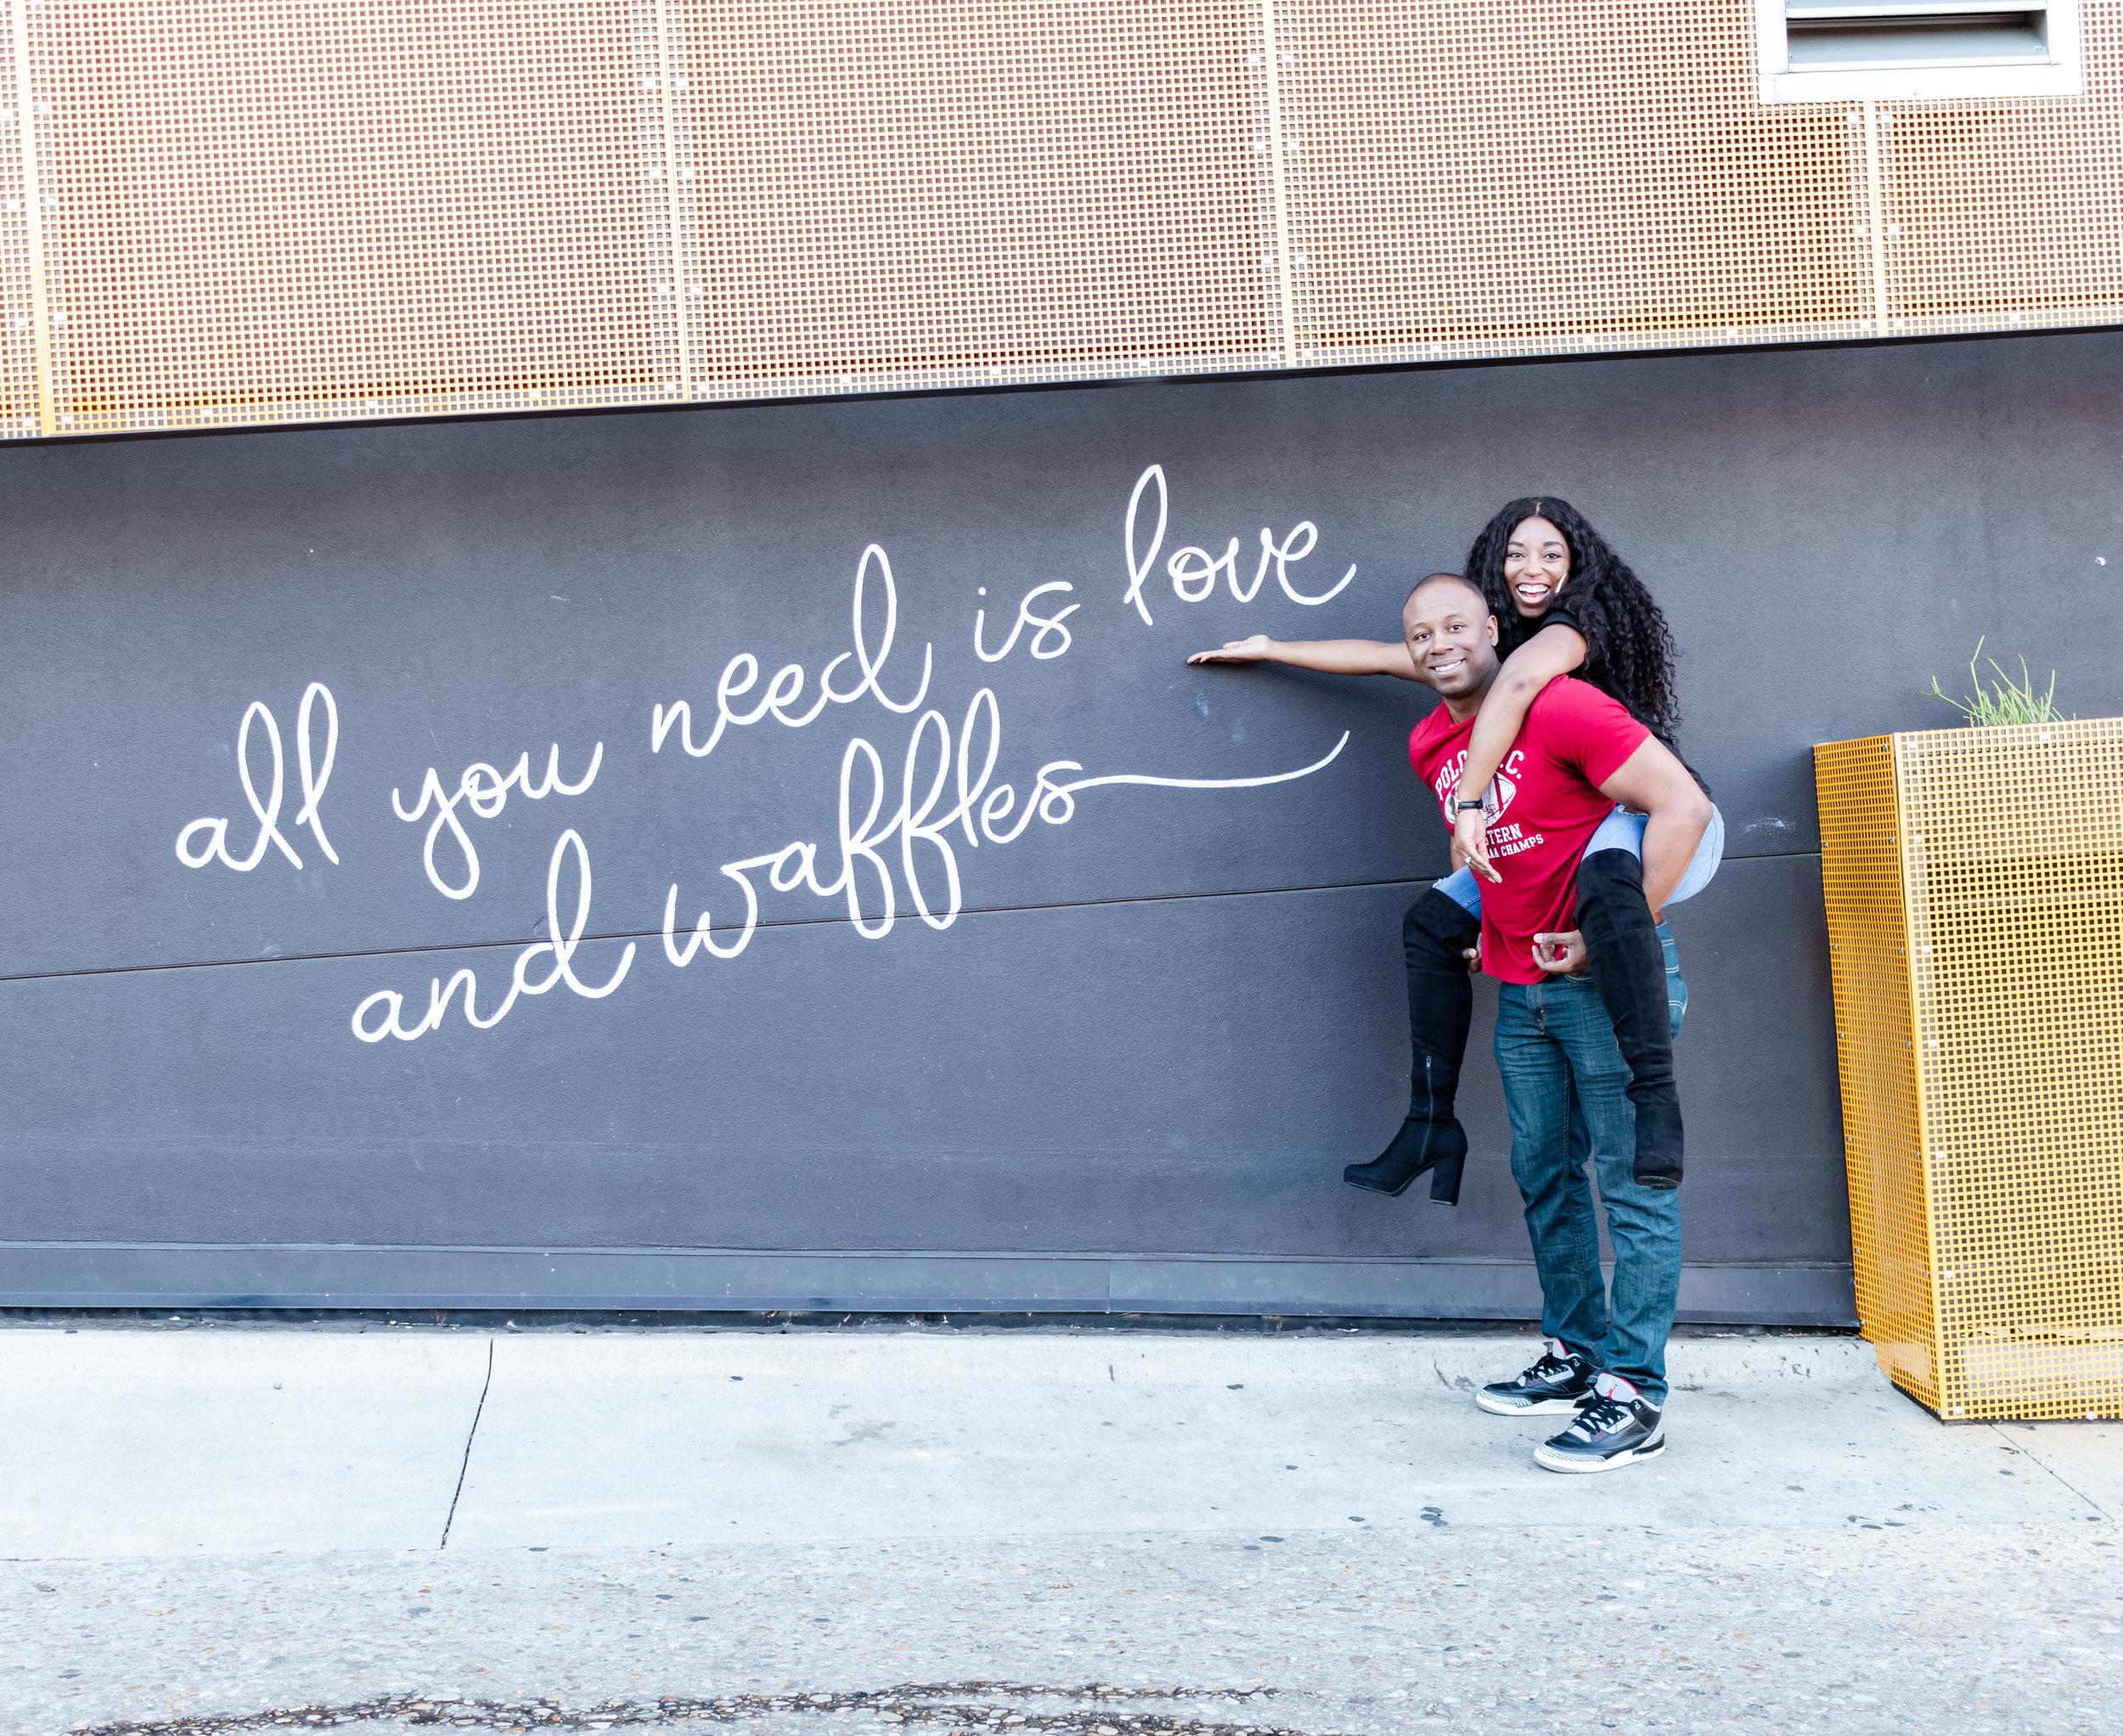 waffle-champion-cute-mural-couples-romantic-weekend-oklahoma-city